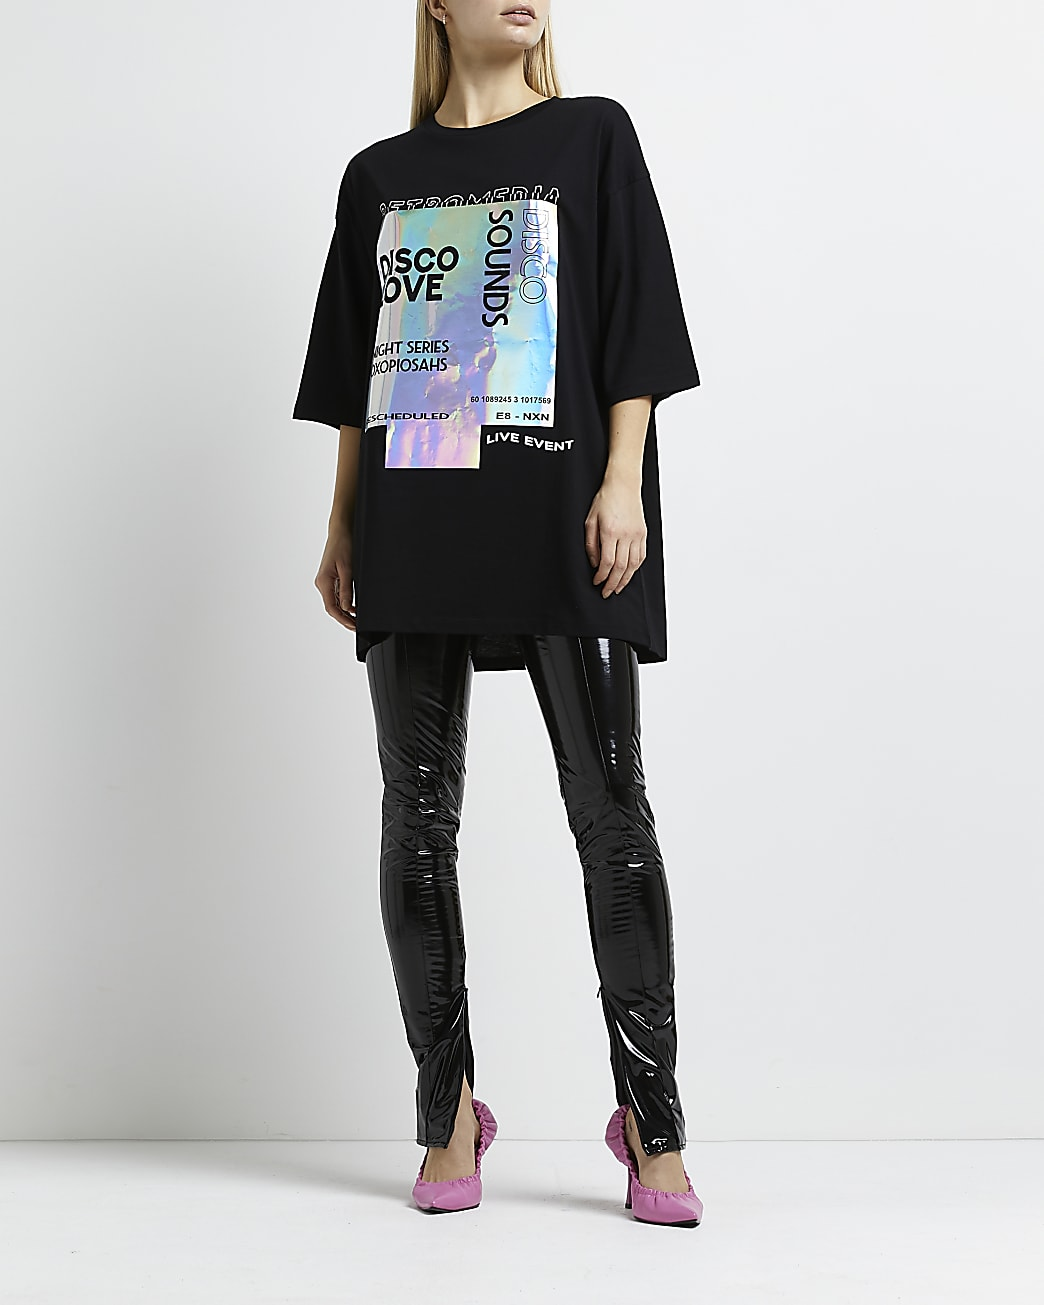 Black 'Disco Love' graphic oversized t-shirt